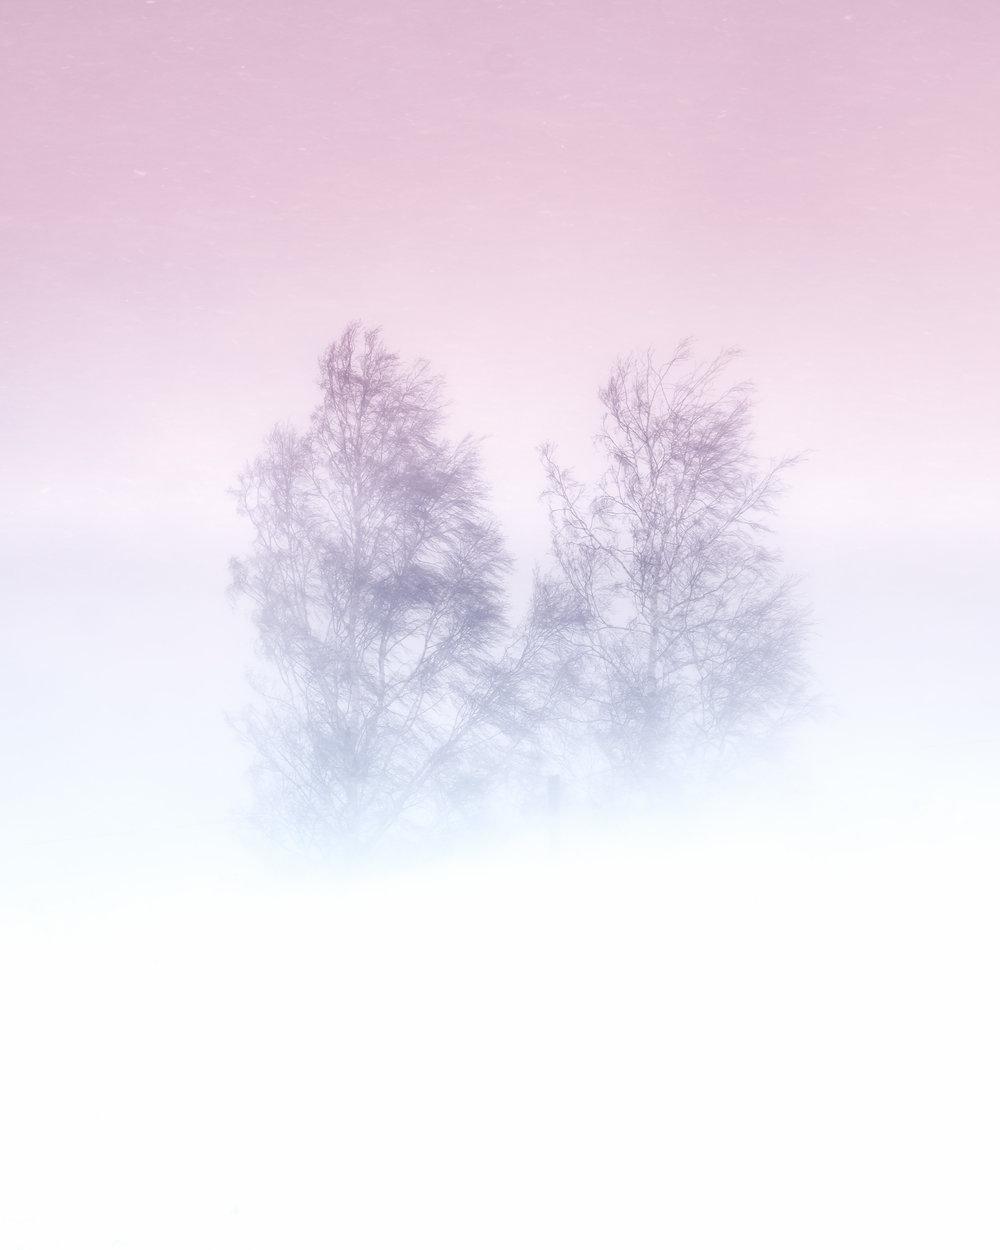 rprum snow blizzard minamilistic 1.jpg